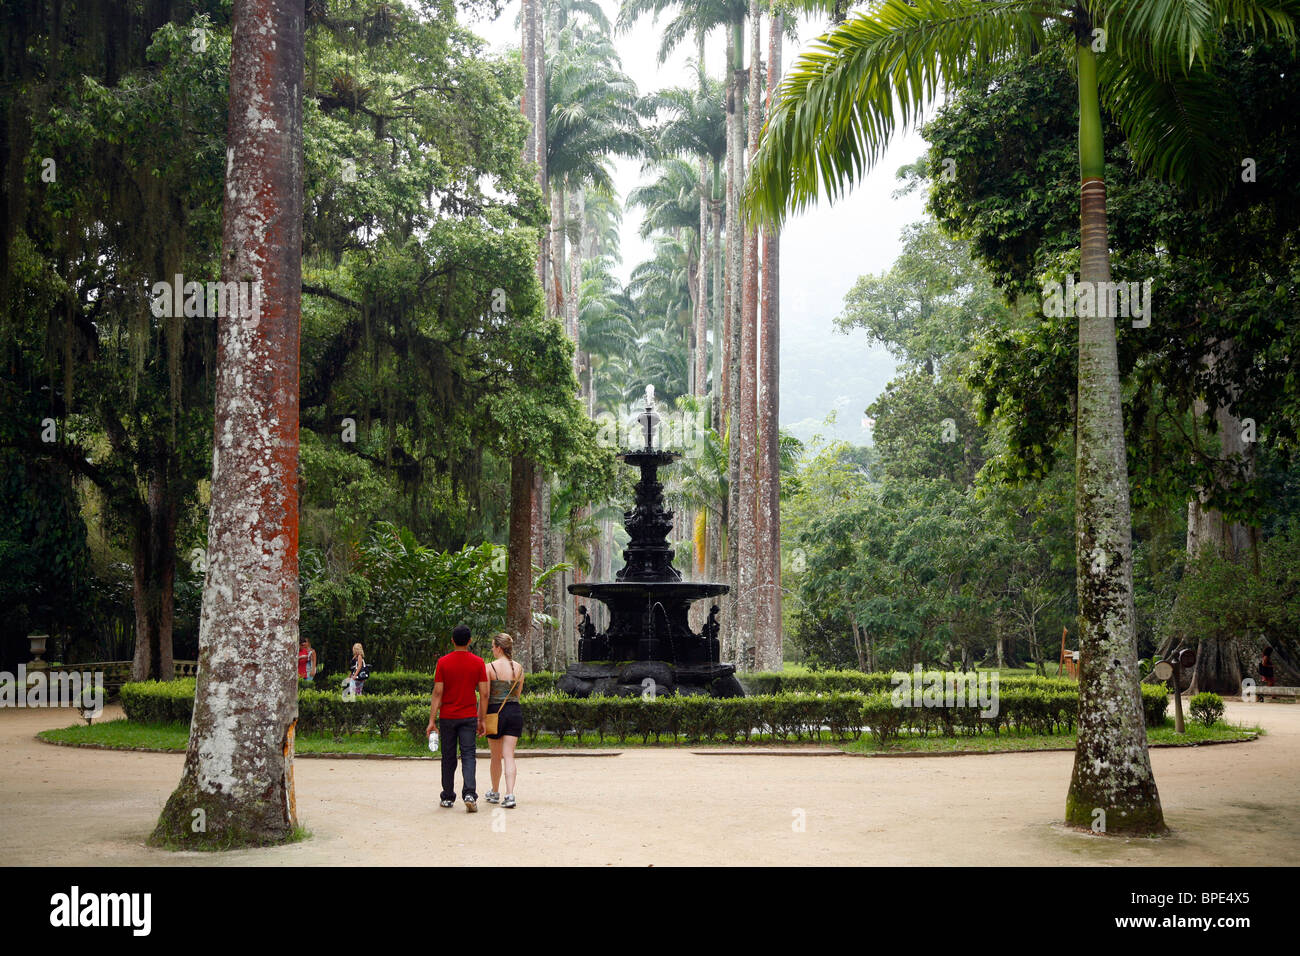 Jardim Botanico oder den Botanischen Garten, Rio De Janeiro, Brasilien. Stockbild